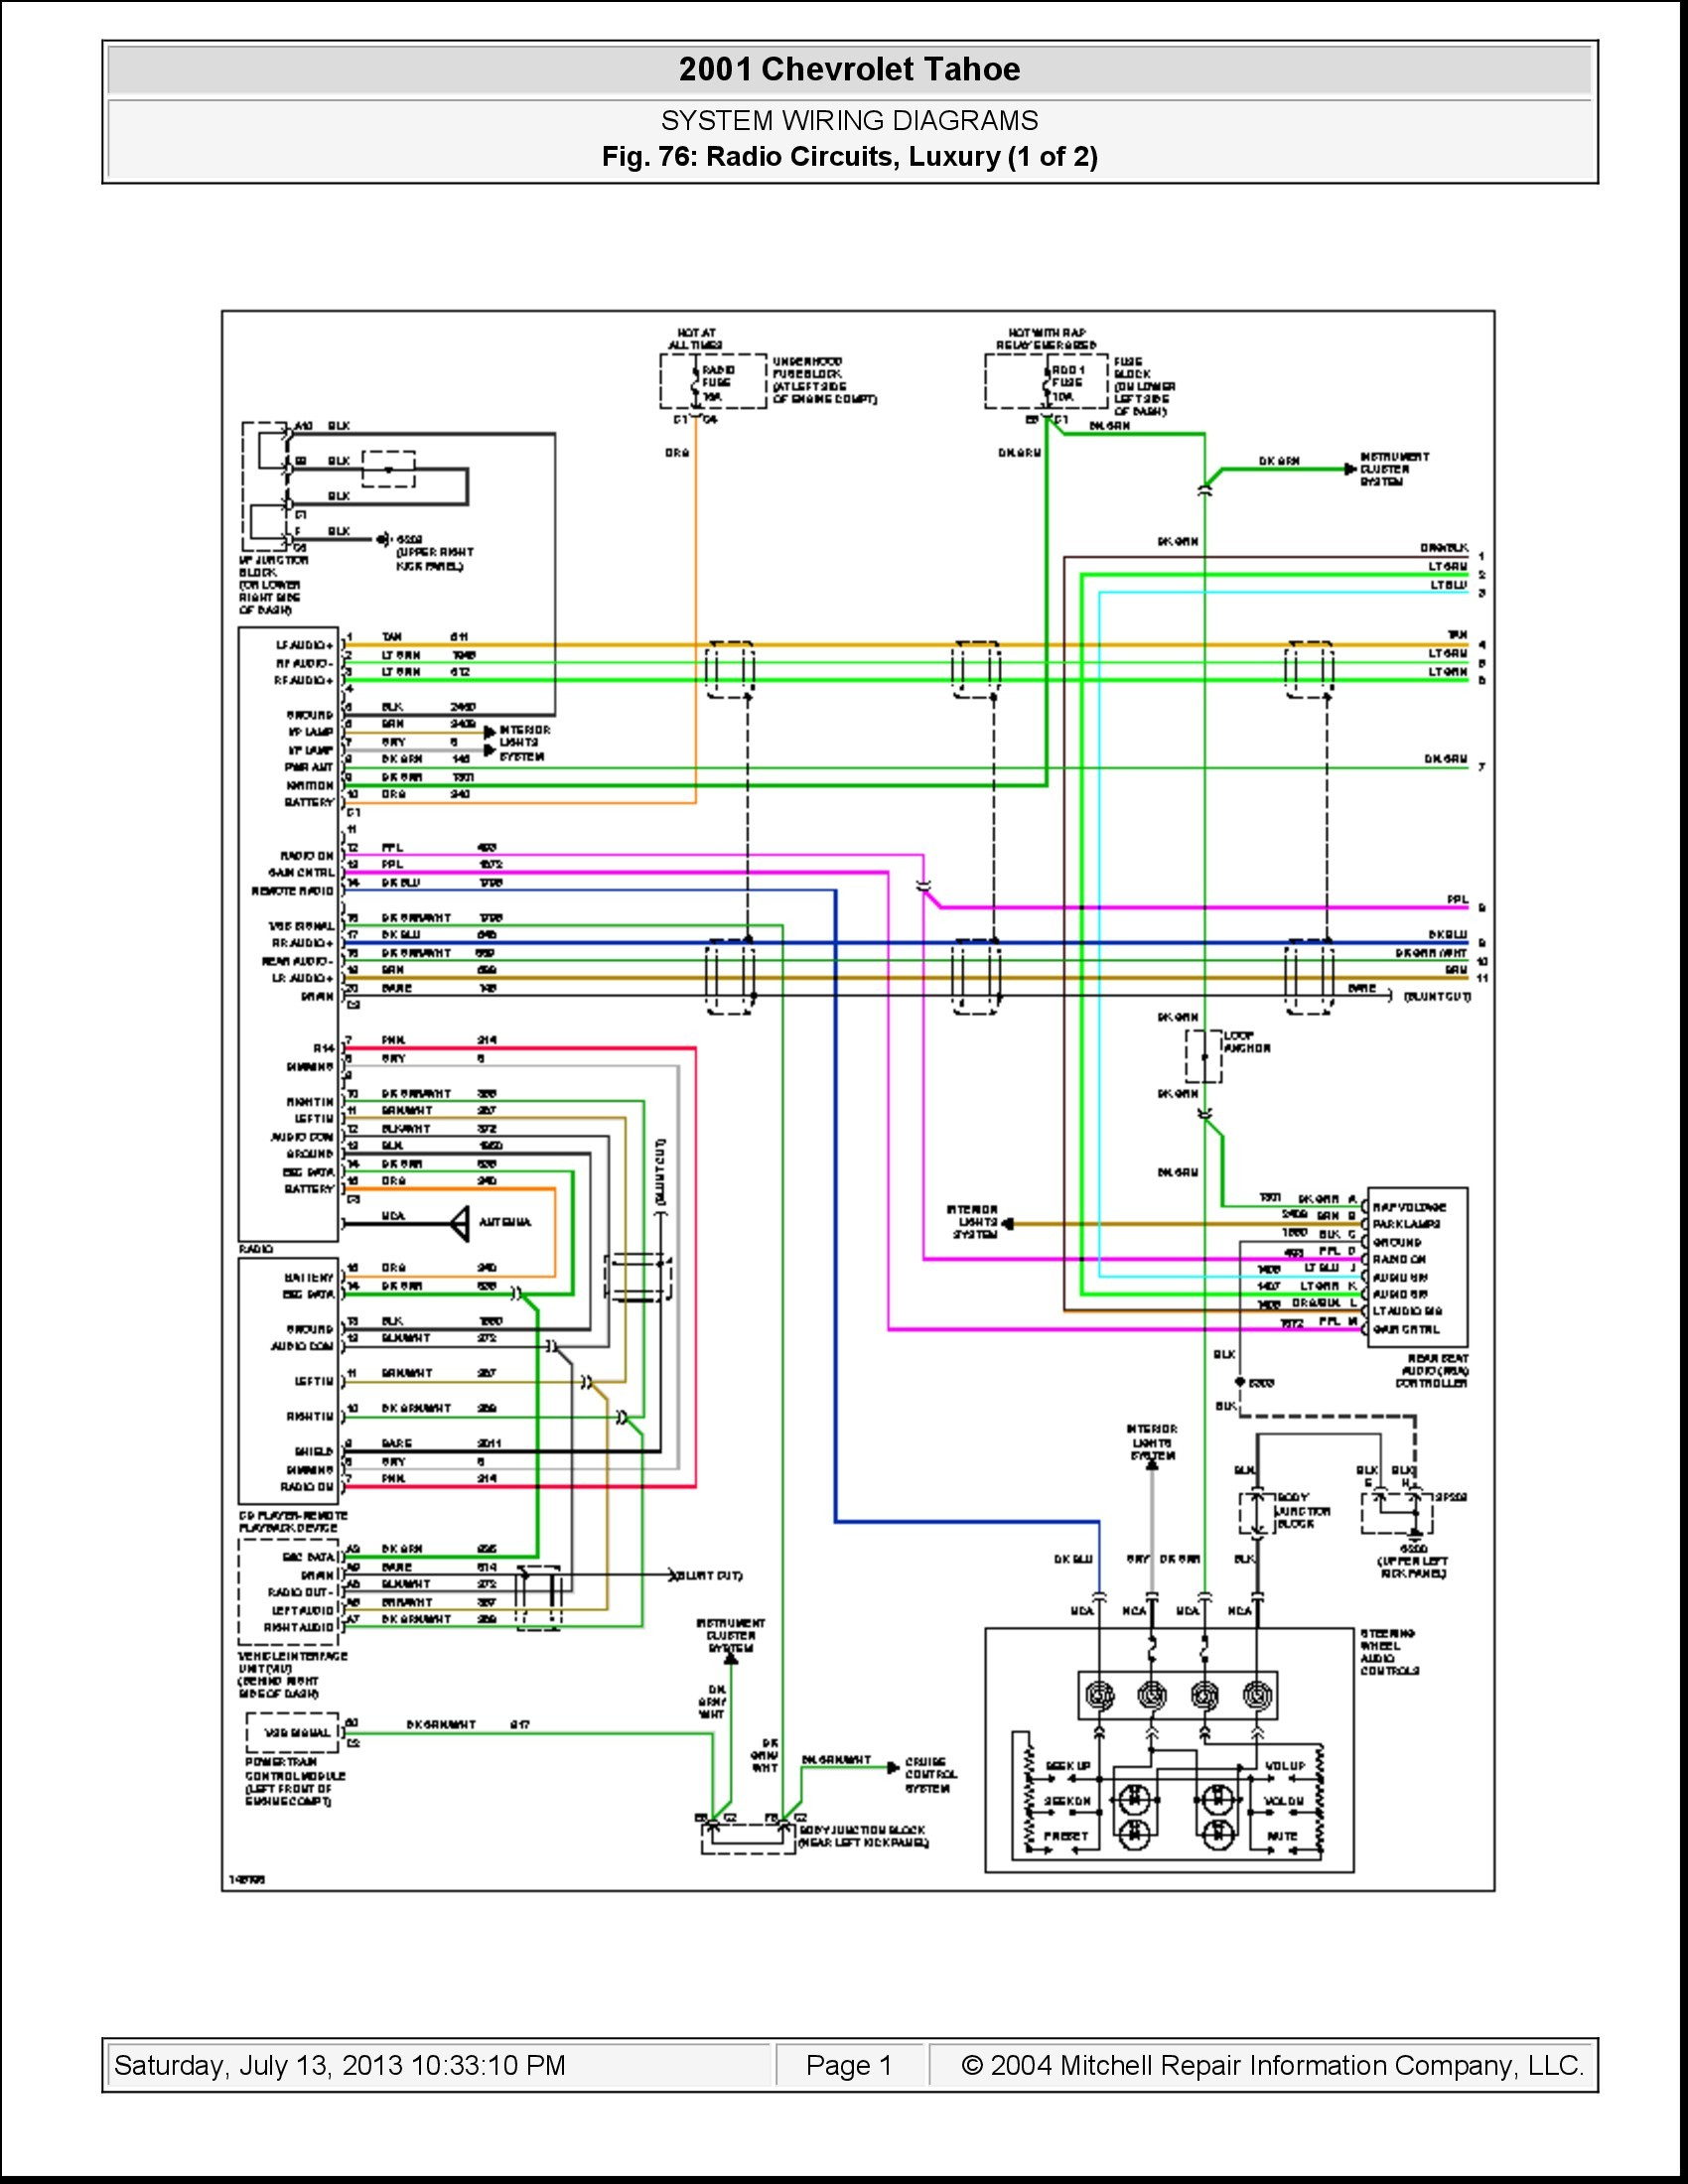 1996 Chevy S10 Wiring Diagram 2001 Chevy S10 Radio Wiring Diagram Collection Of 1996 Chevy S10 Wiring Diagram 89 Chevy 1500 Wiring Diagram Trusted Wiring Diagram